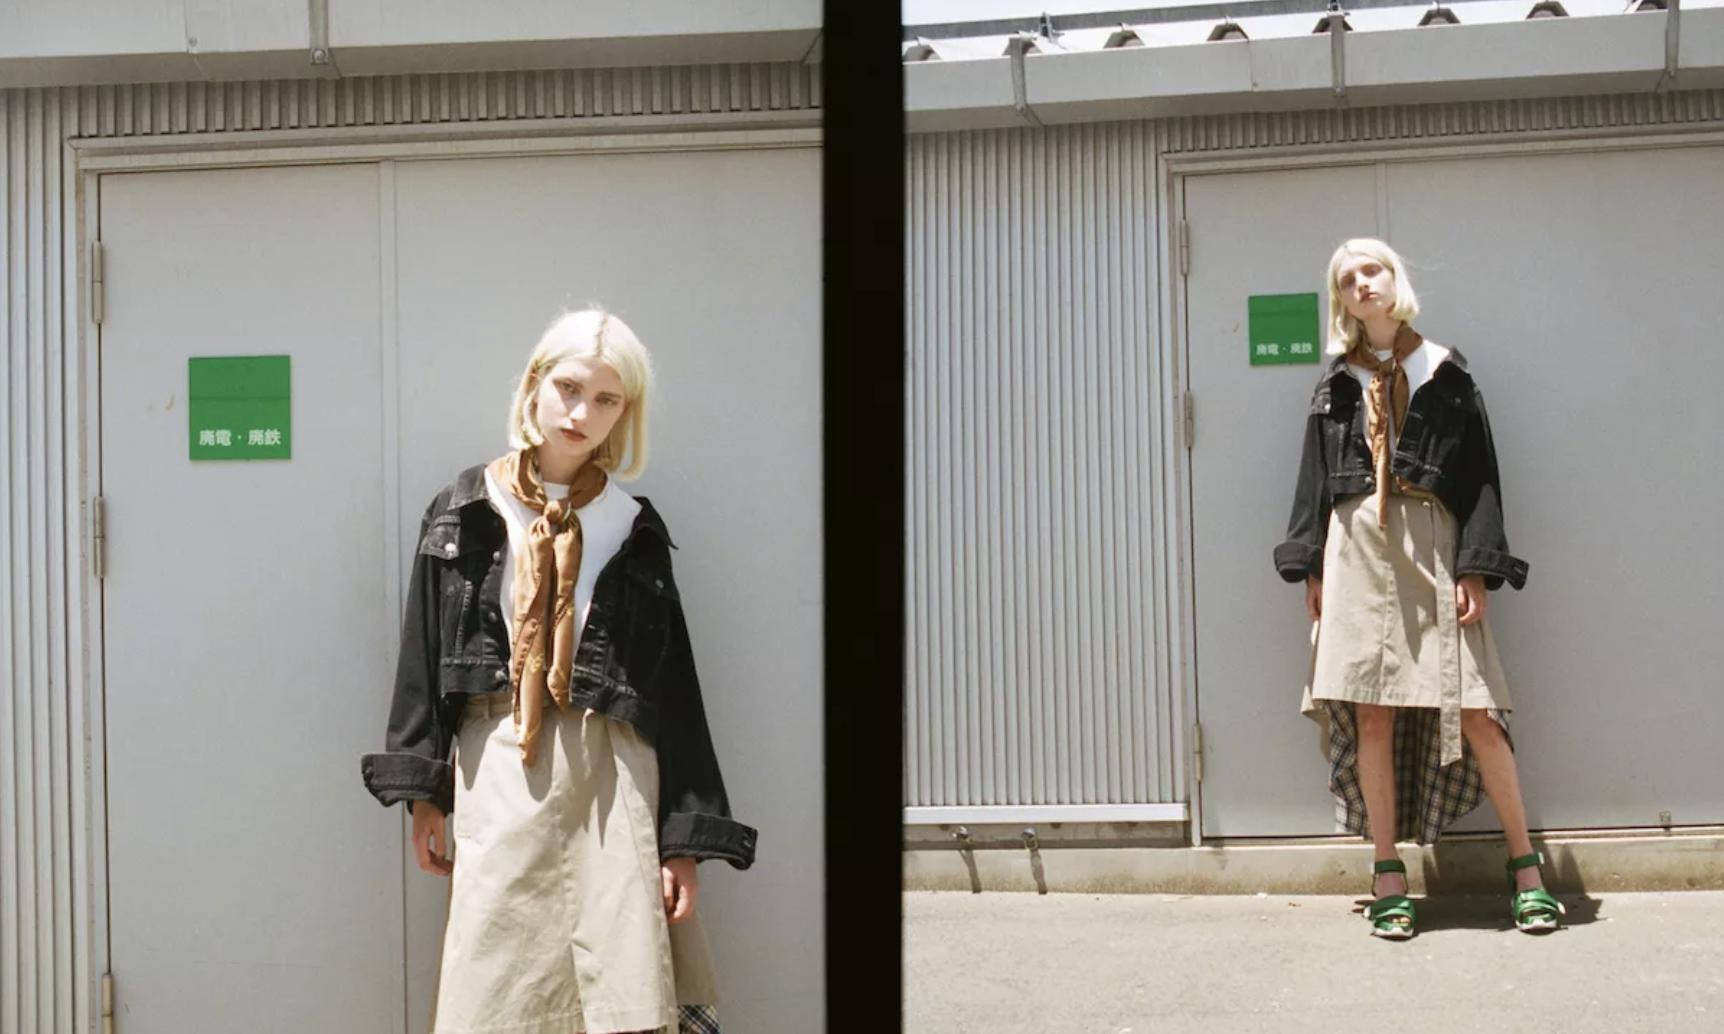 Maison MIHARA YASUHIRO 释出 2019 早春女装系列 Lookbook